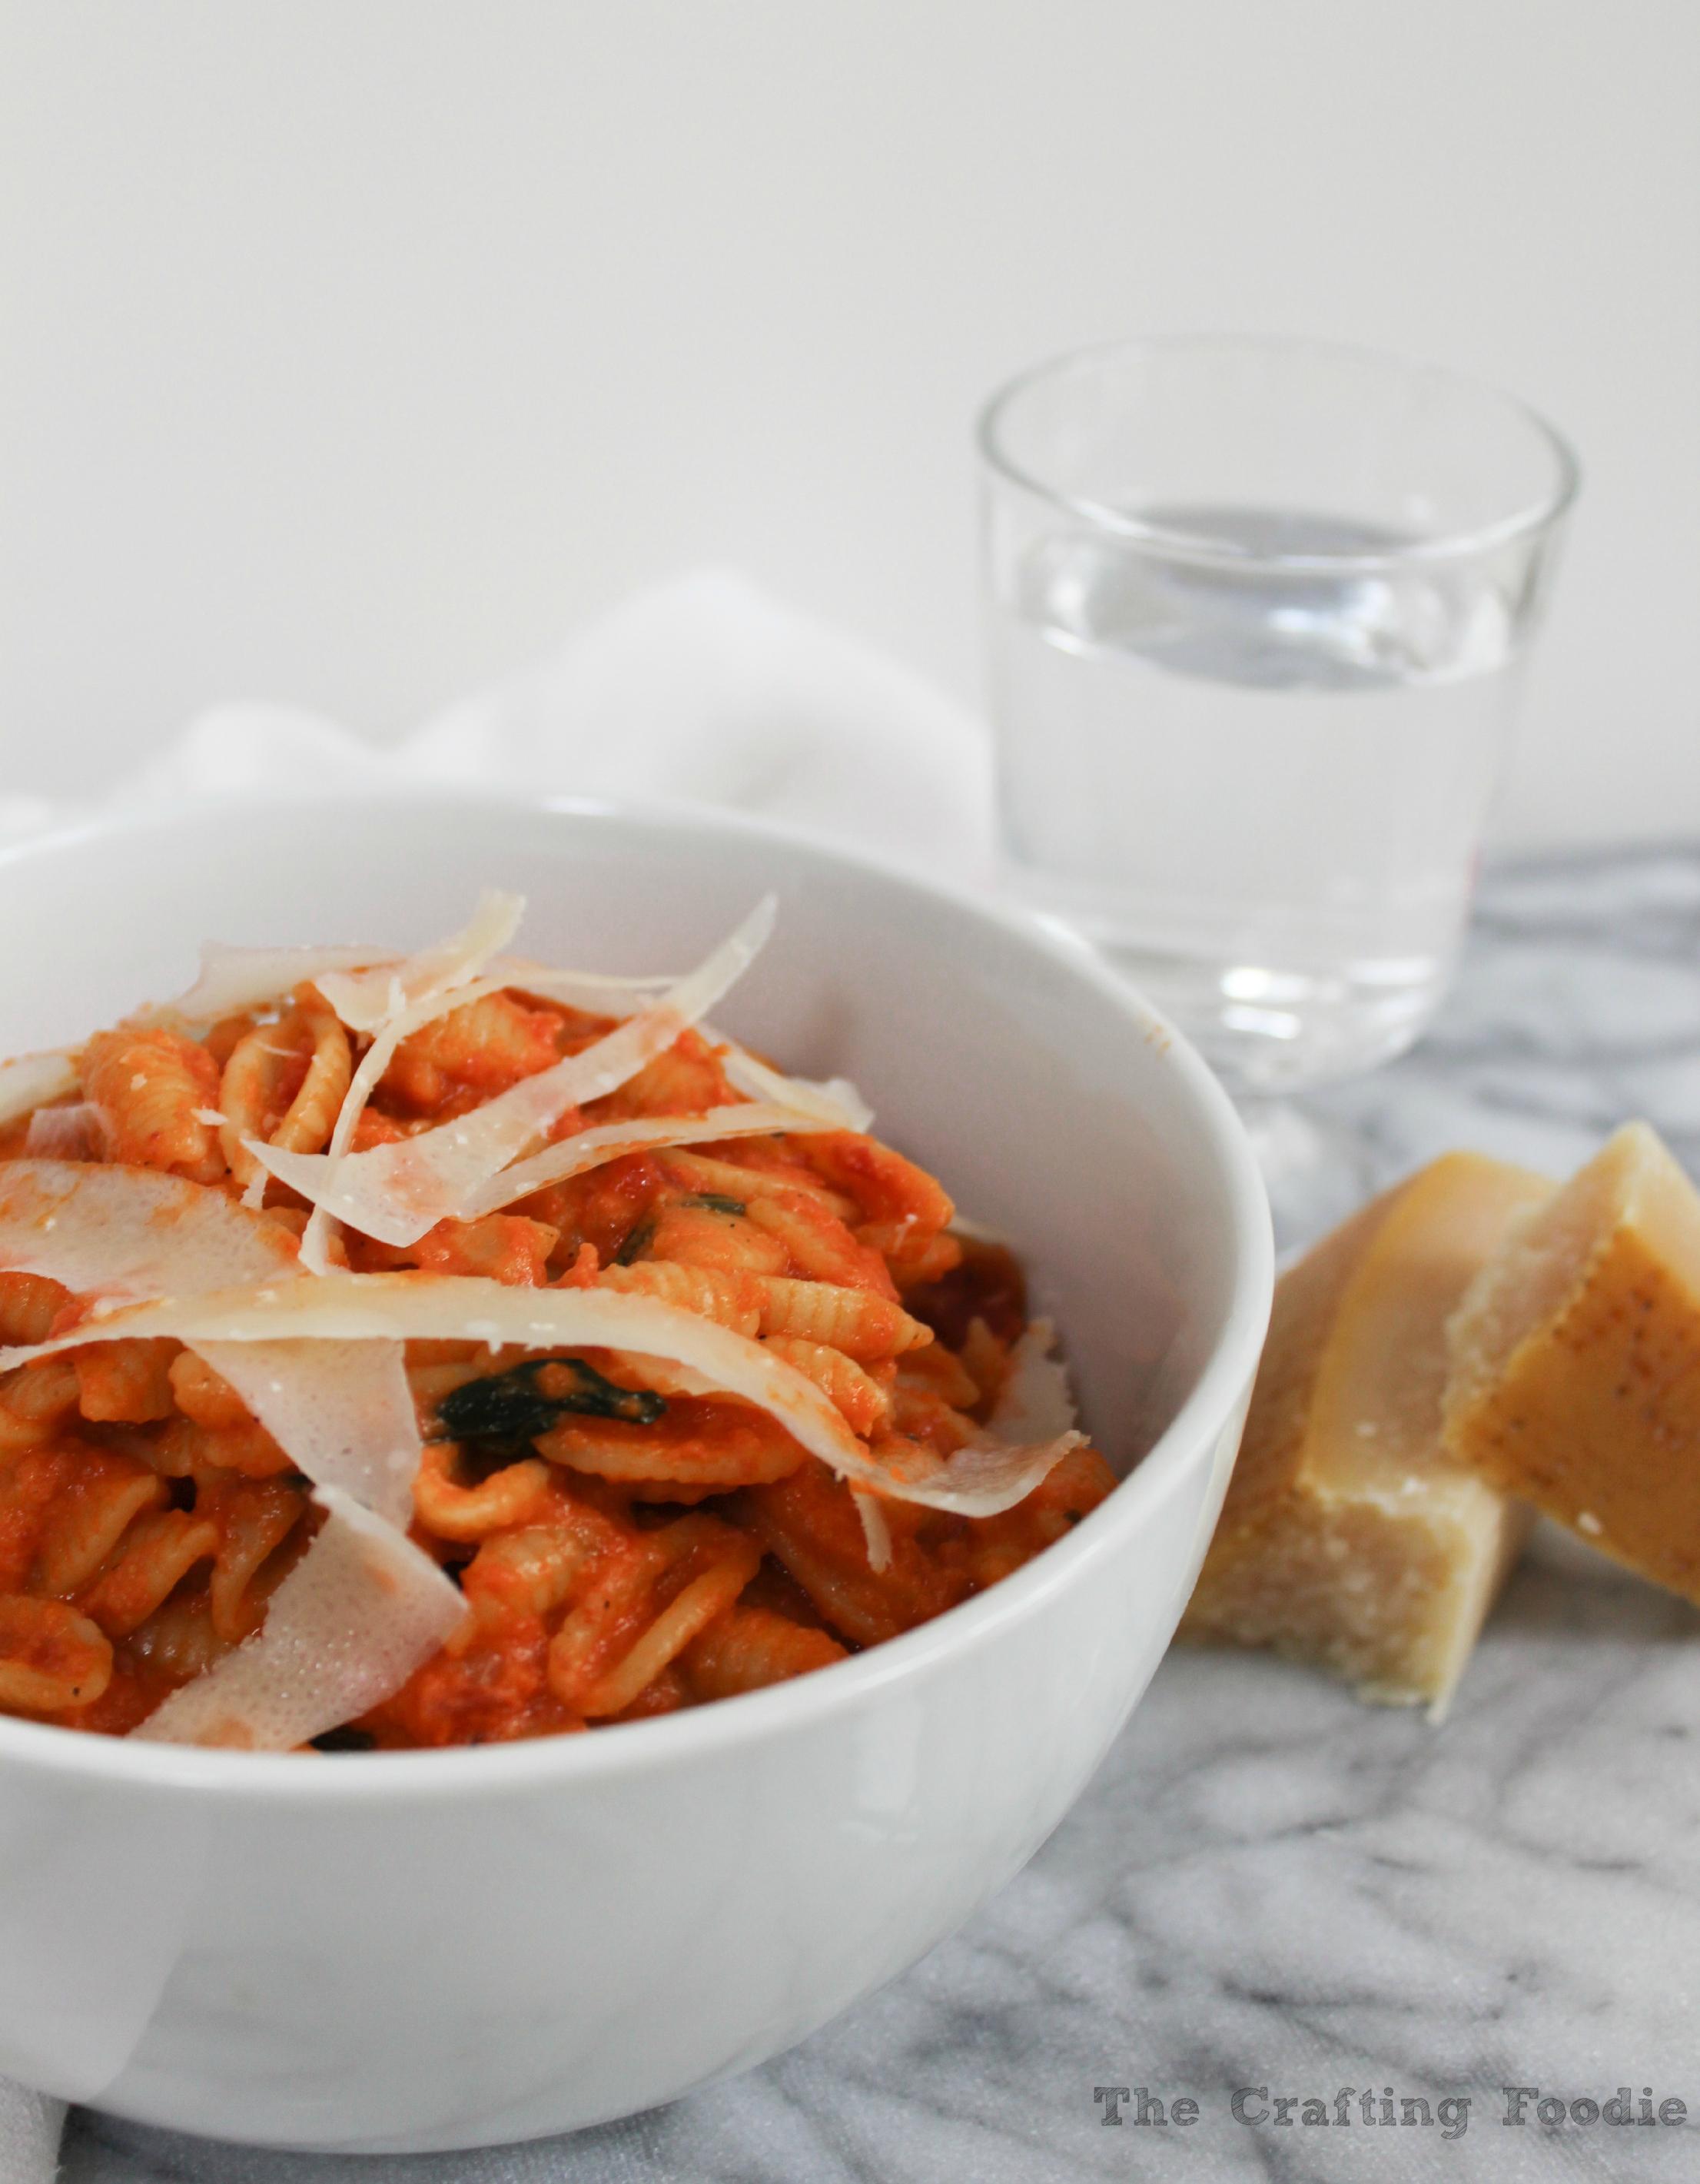 Creamy Tomato Pasta Sauce The Crafting Foodie